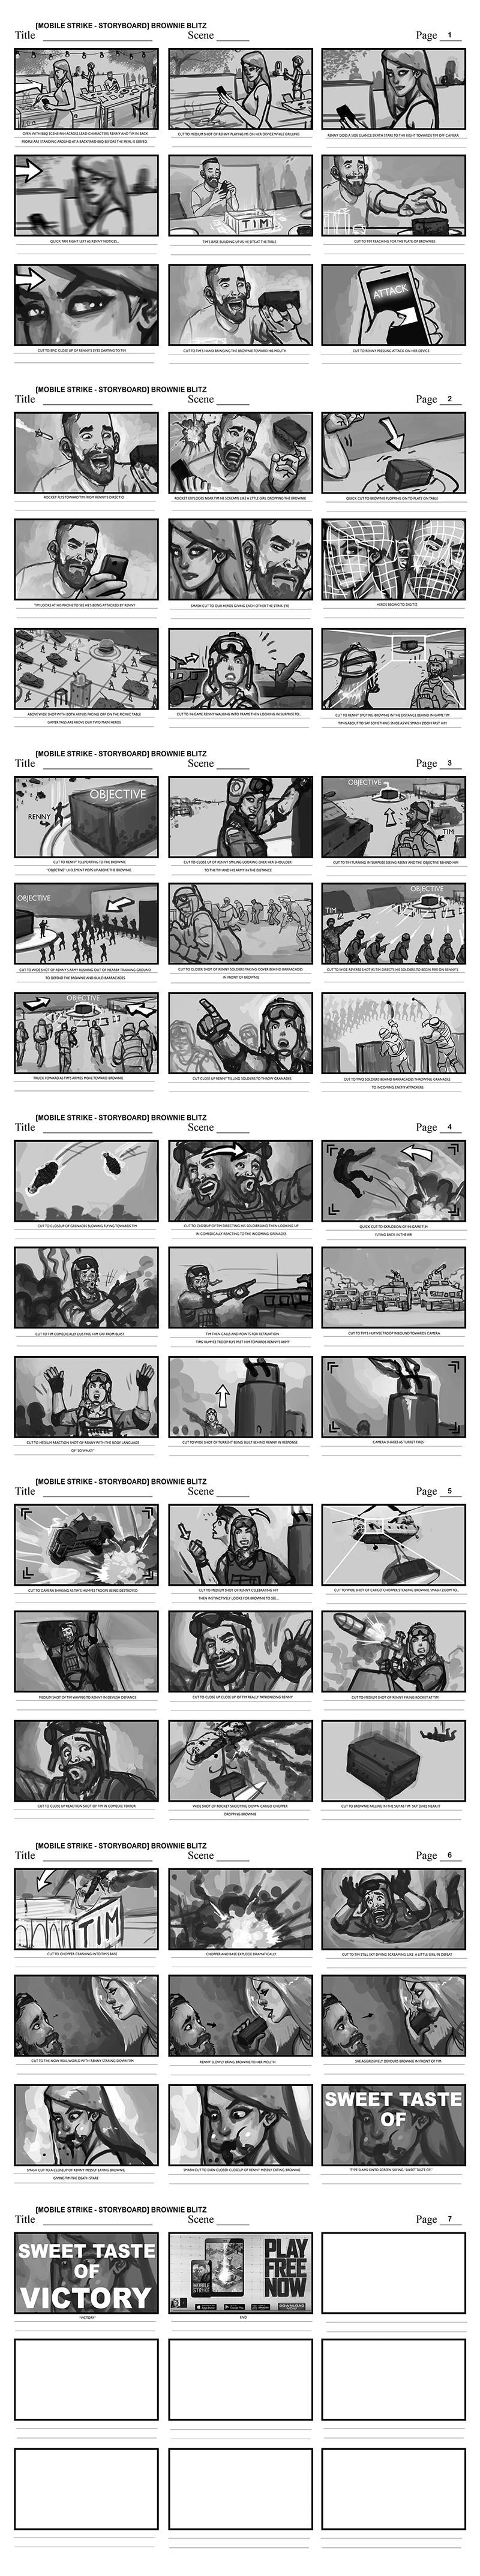 Efrem palacios mobile strike storyboard brownie blitz